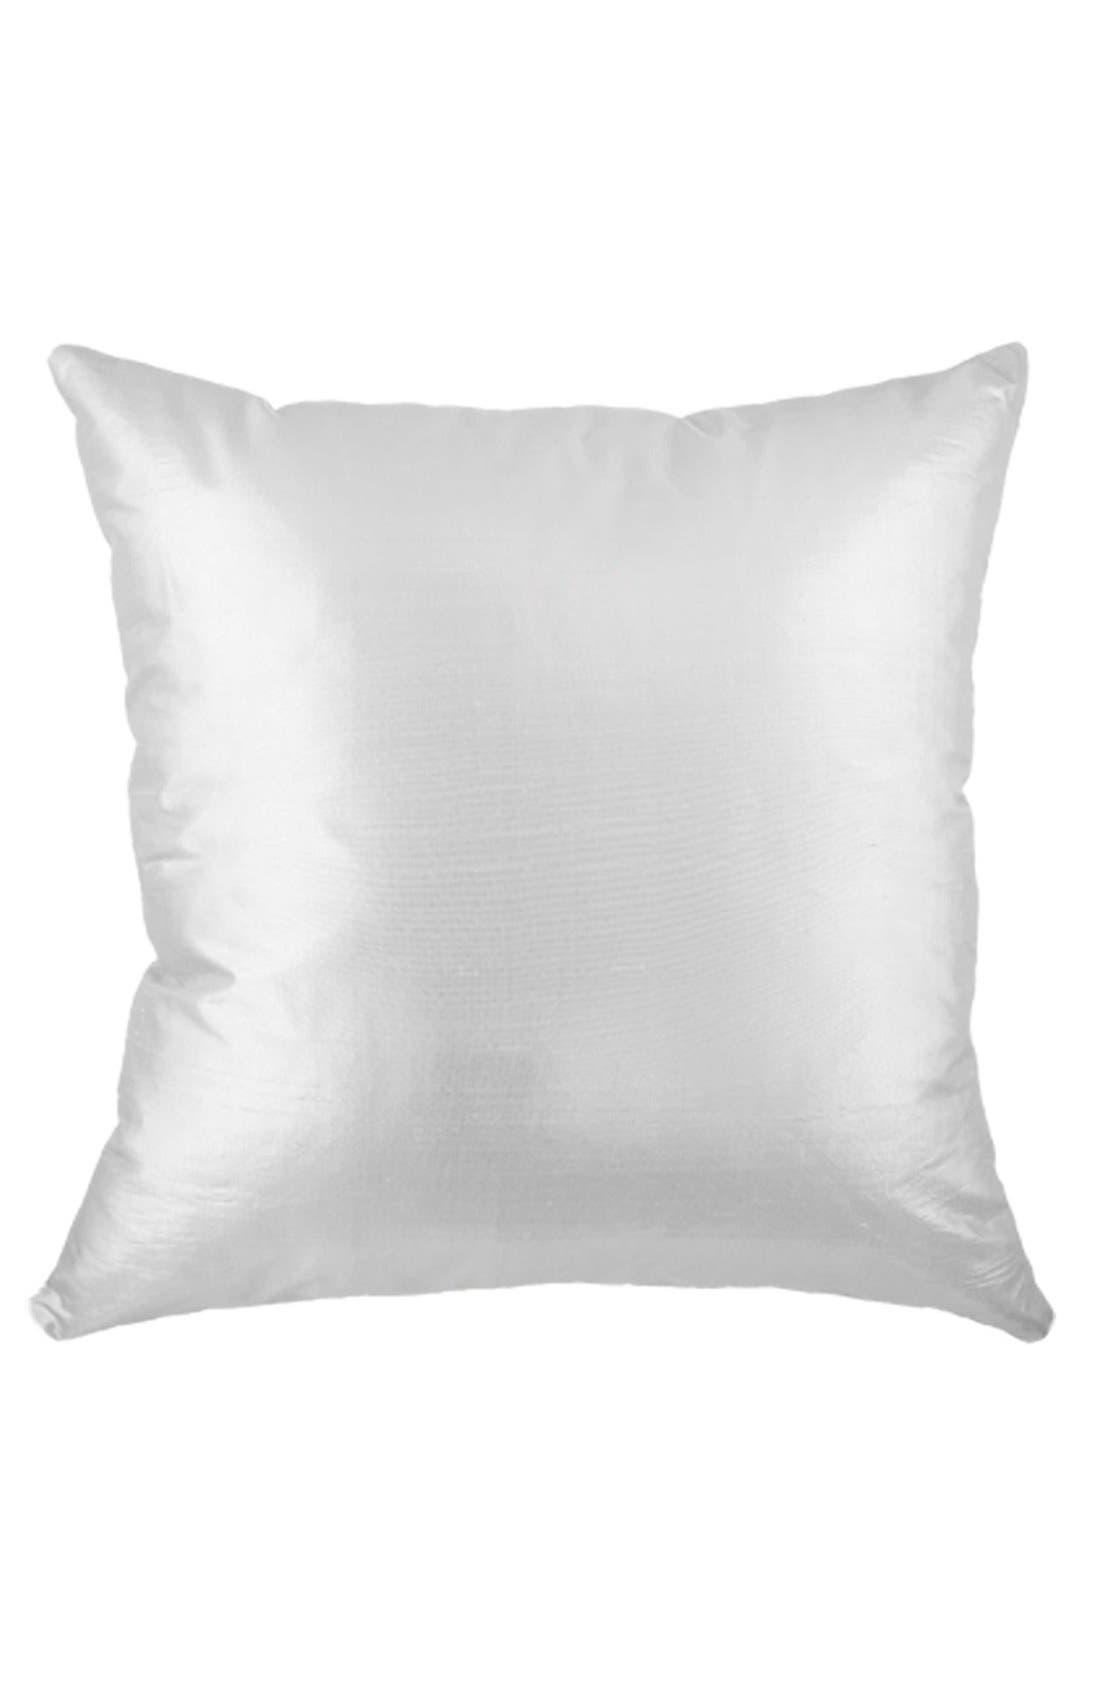 Alternate Image 1 Selected - KAS Designs 'Space' Pillow